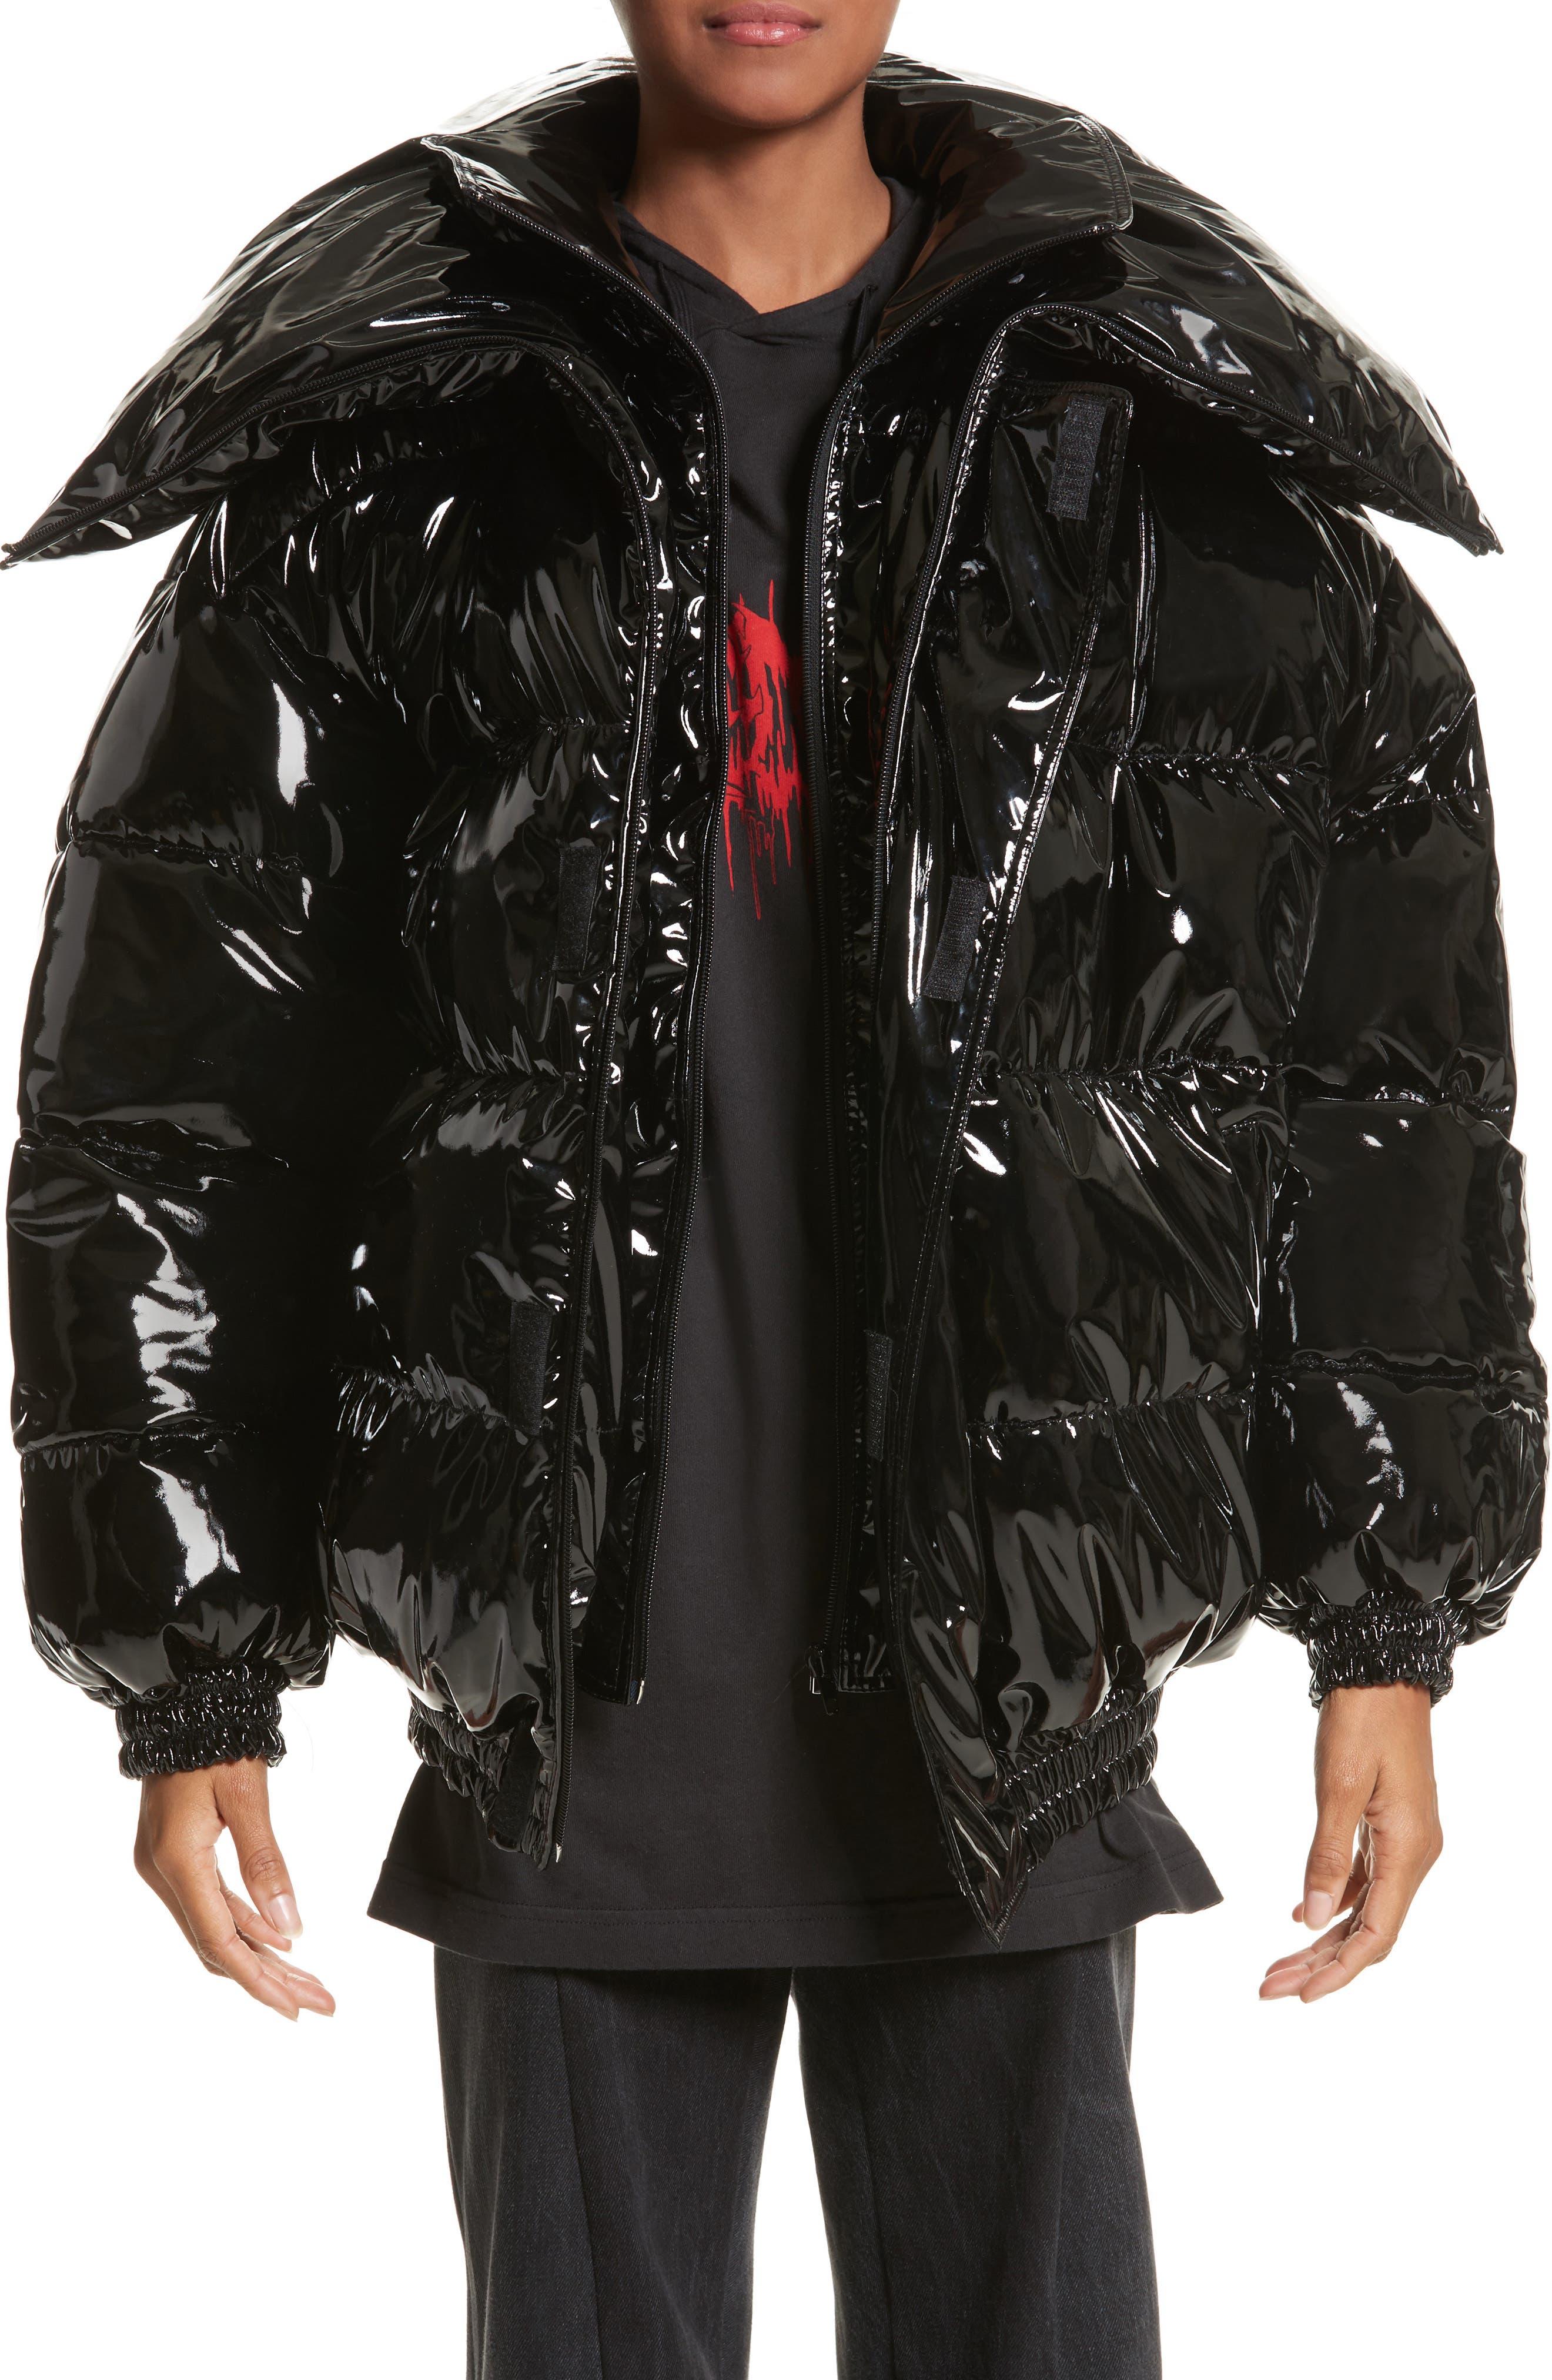 Miss Webcam Puffer Jacket,                         Main,                         color, 001